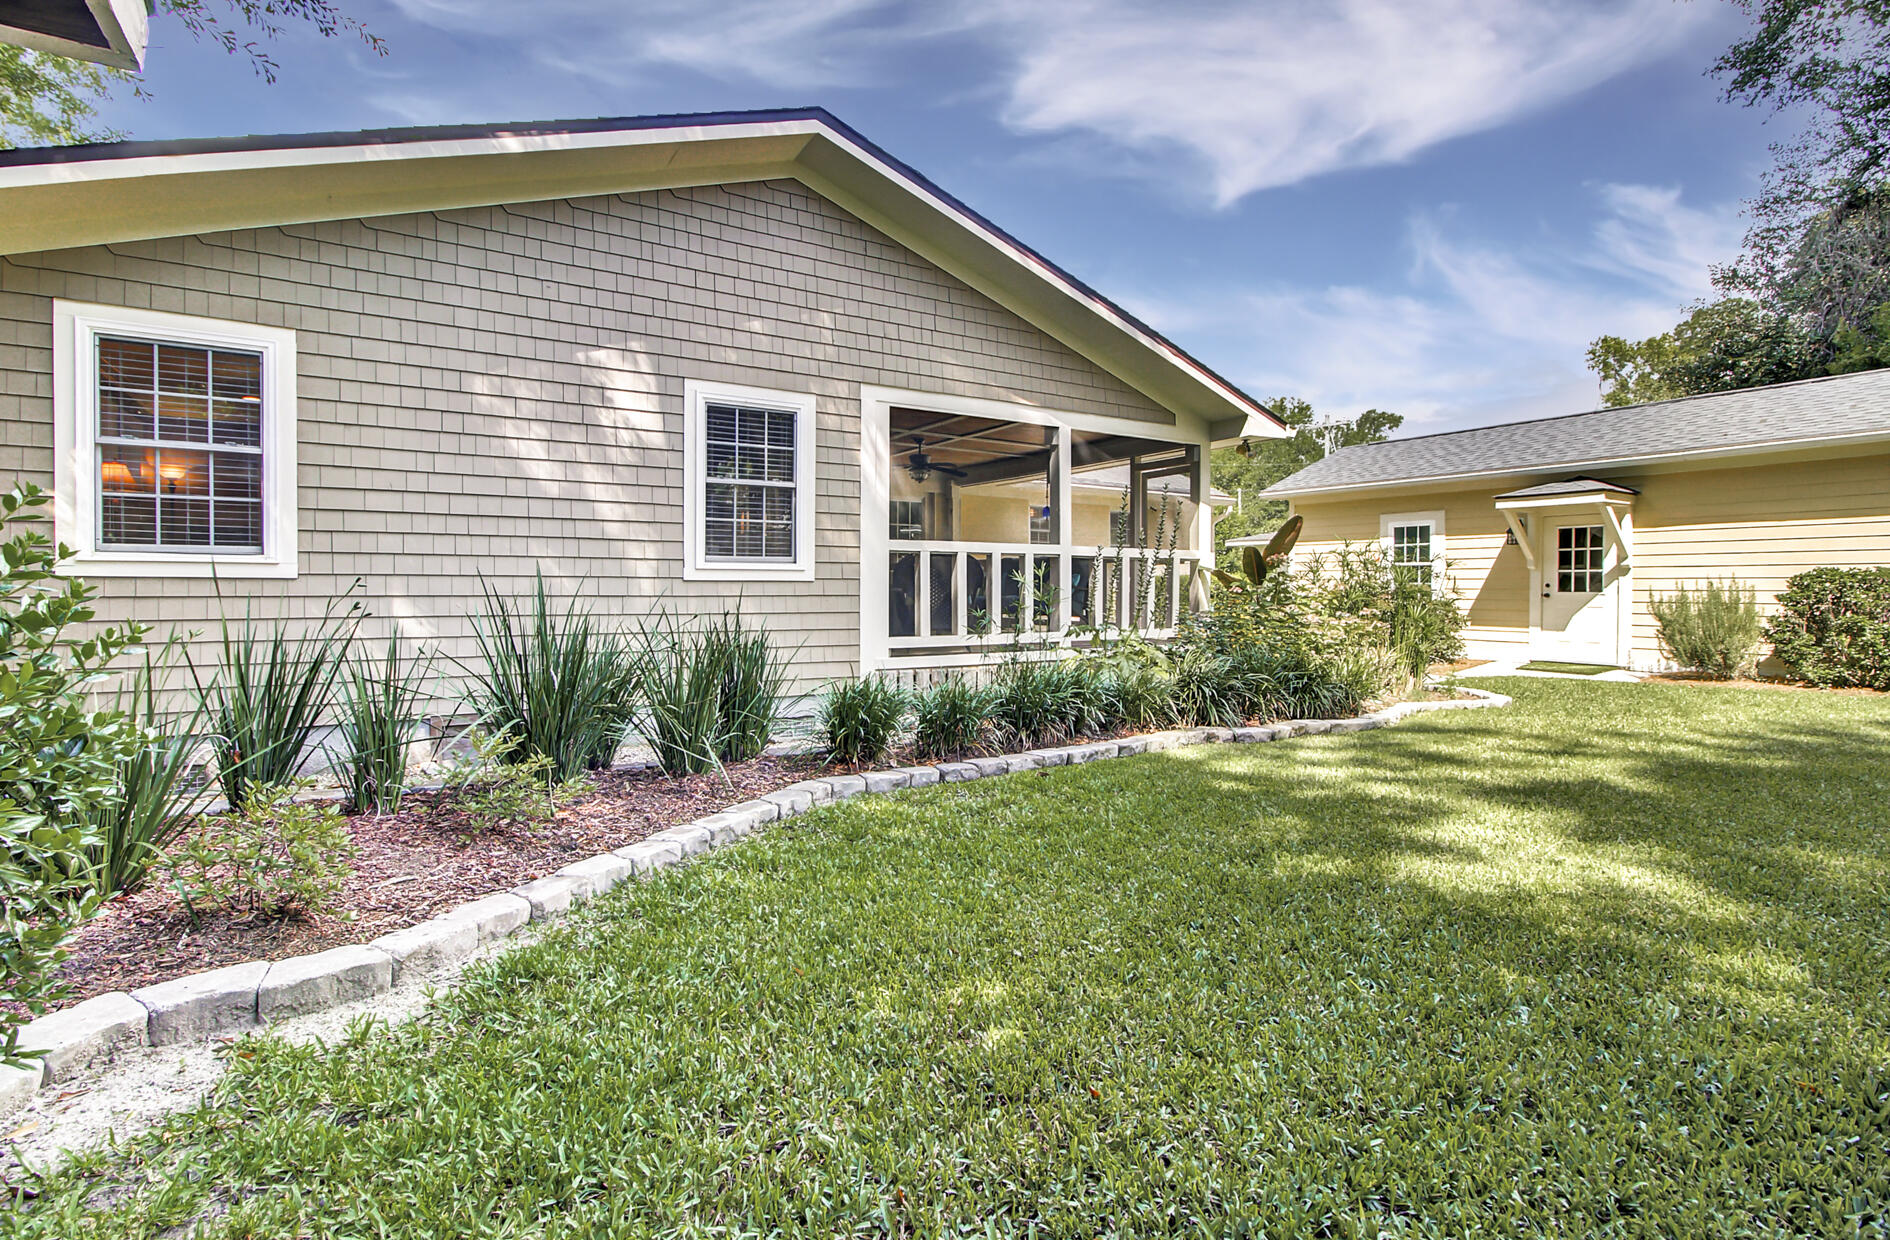 Old Mt Pleasant Homes For Sale - 1466 Barbara, Mount Pleasant, SC - 2